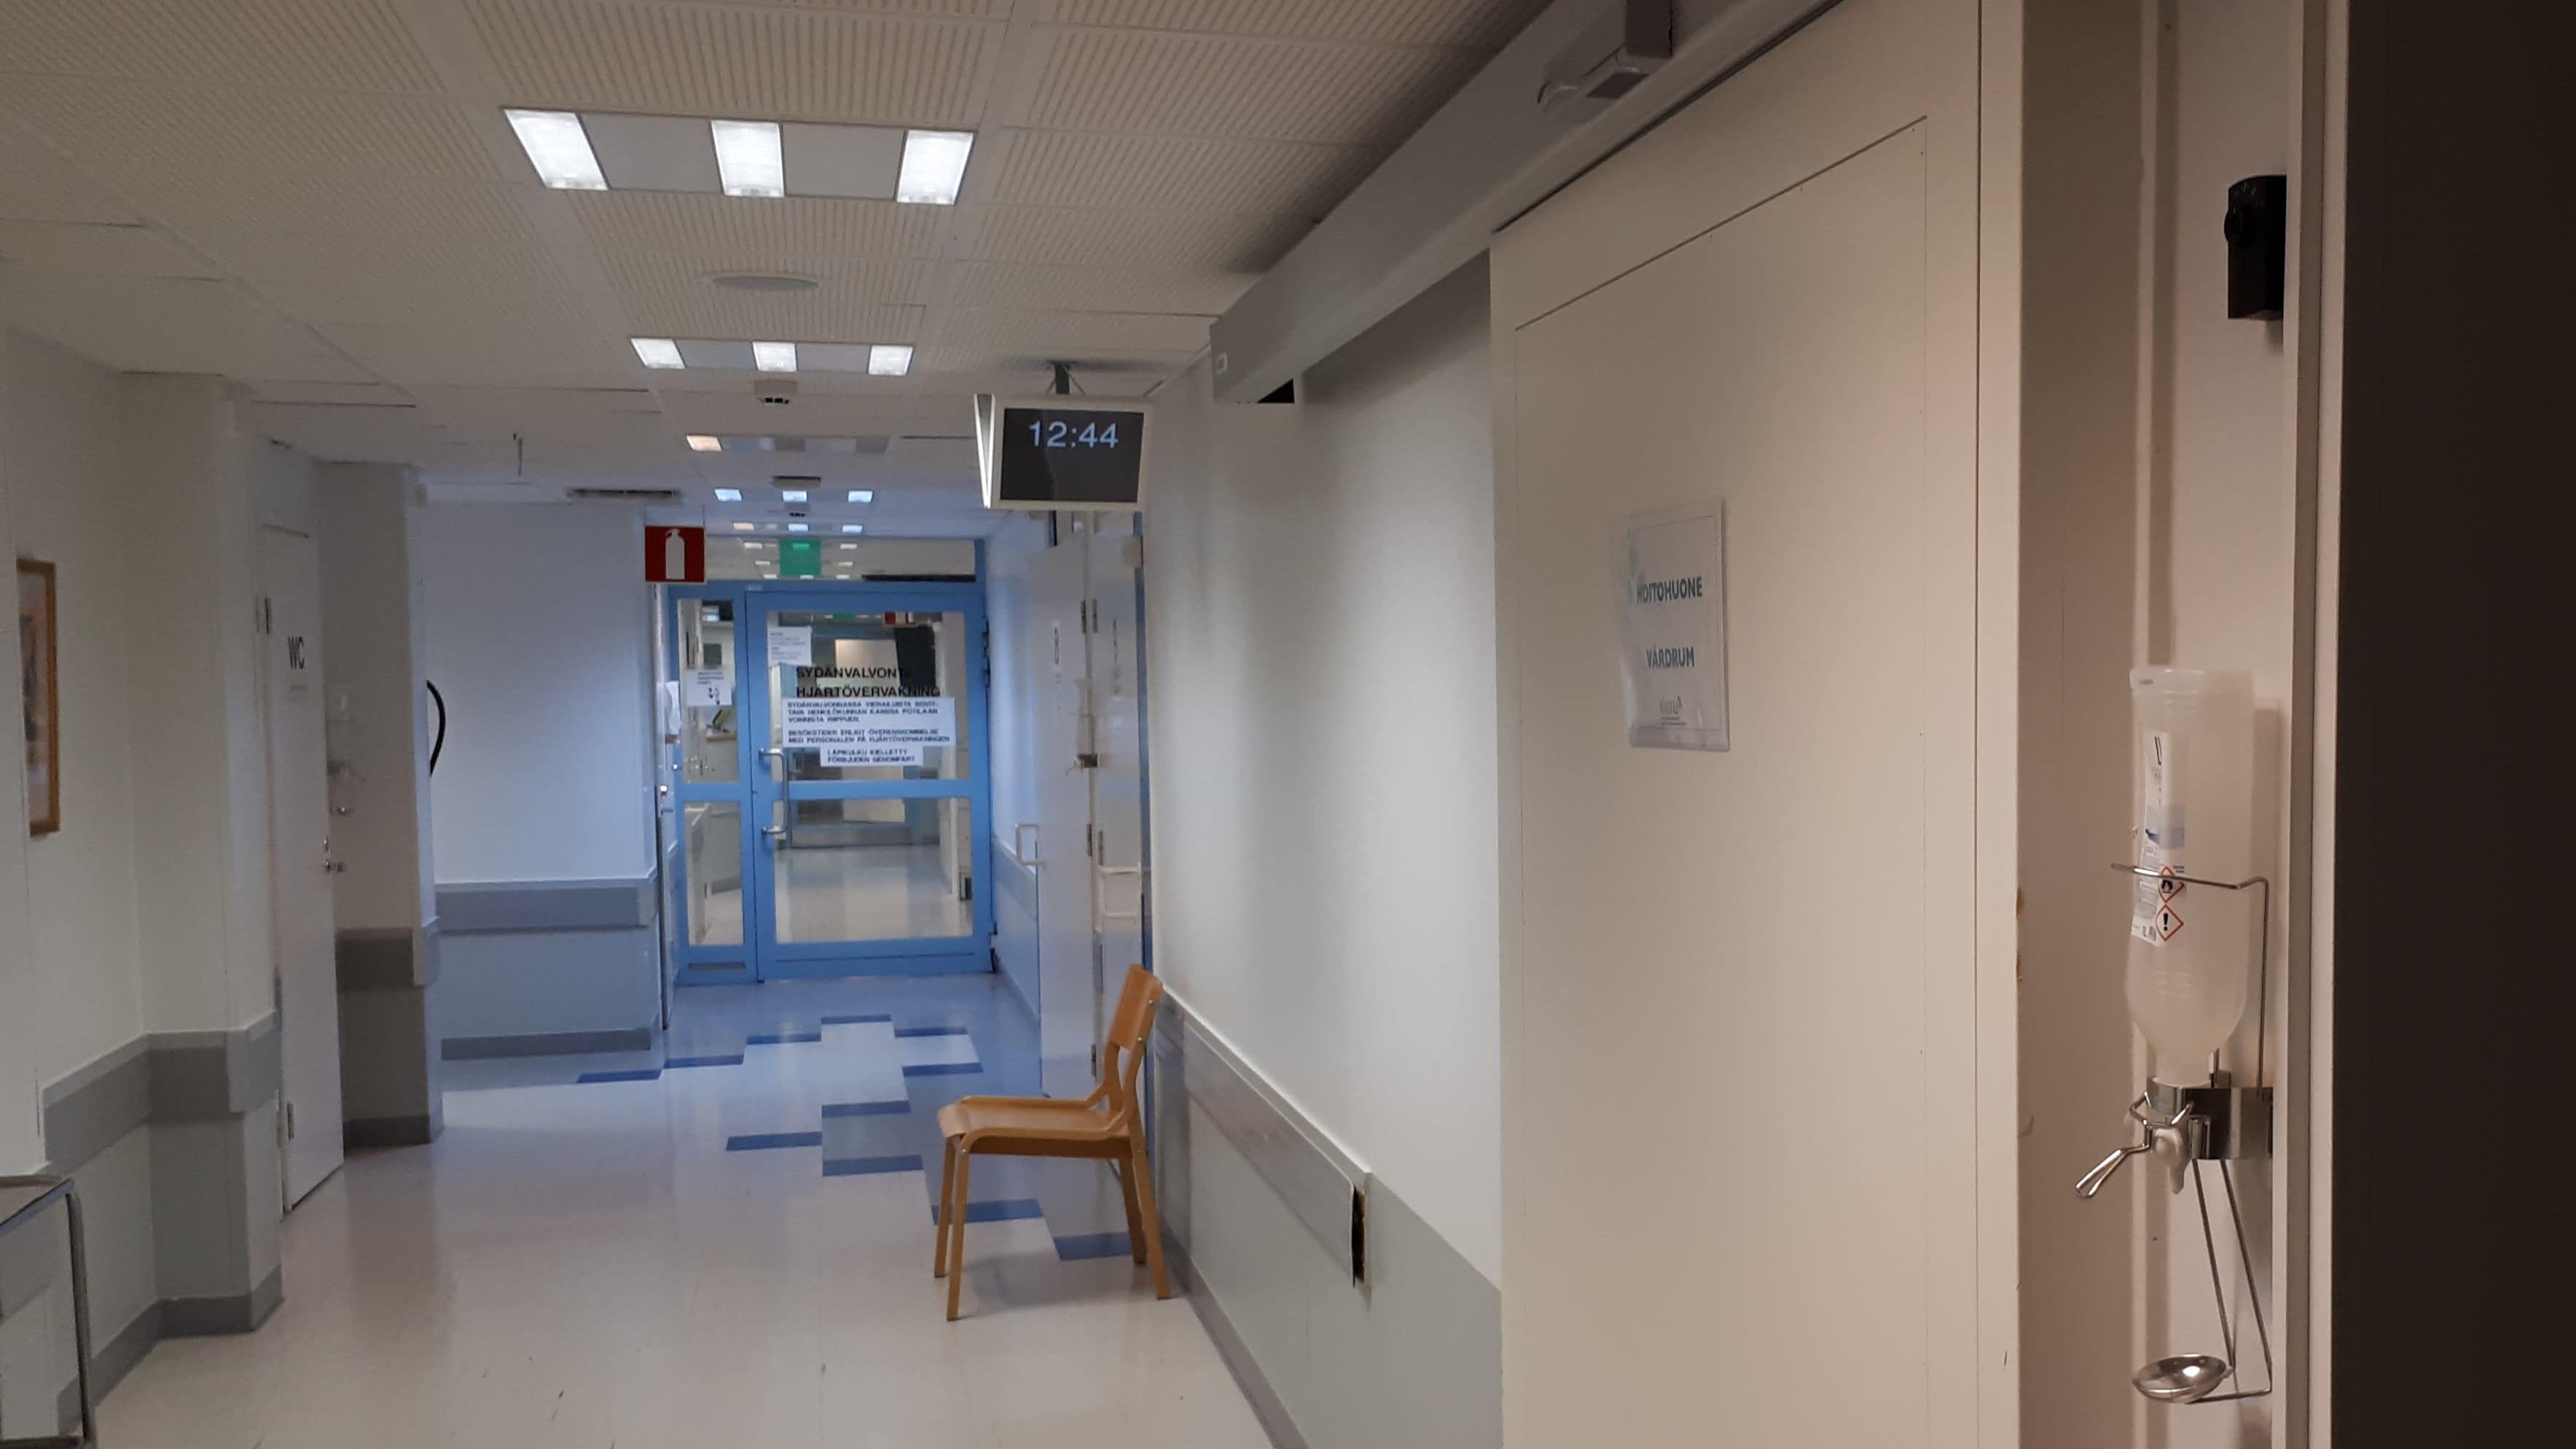 Mellersta Österbottens centralsjukhus i Karleby. Keski-Pohjanmaan Keskussairaala